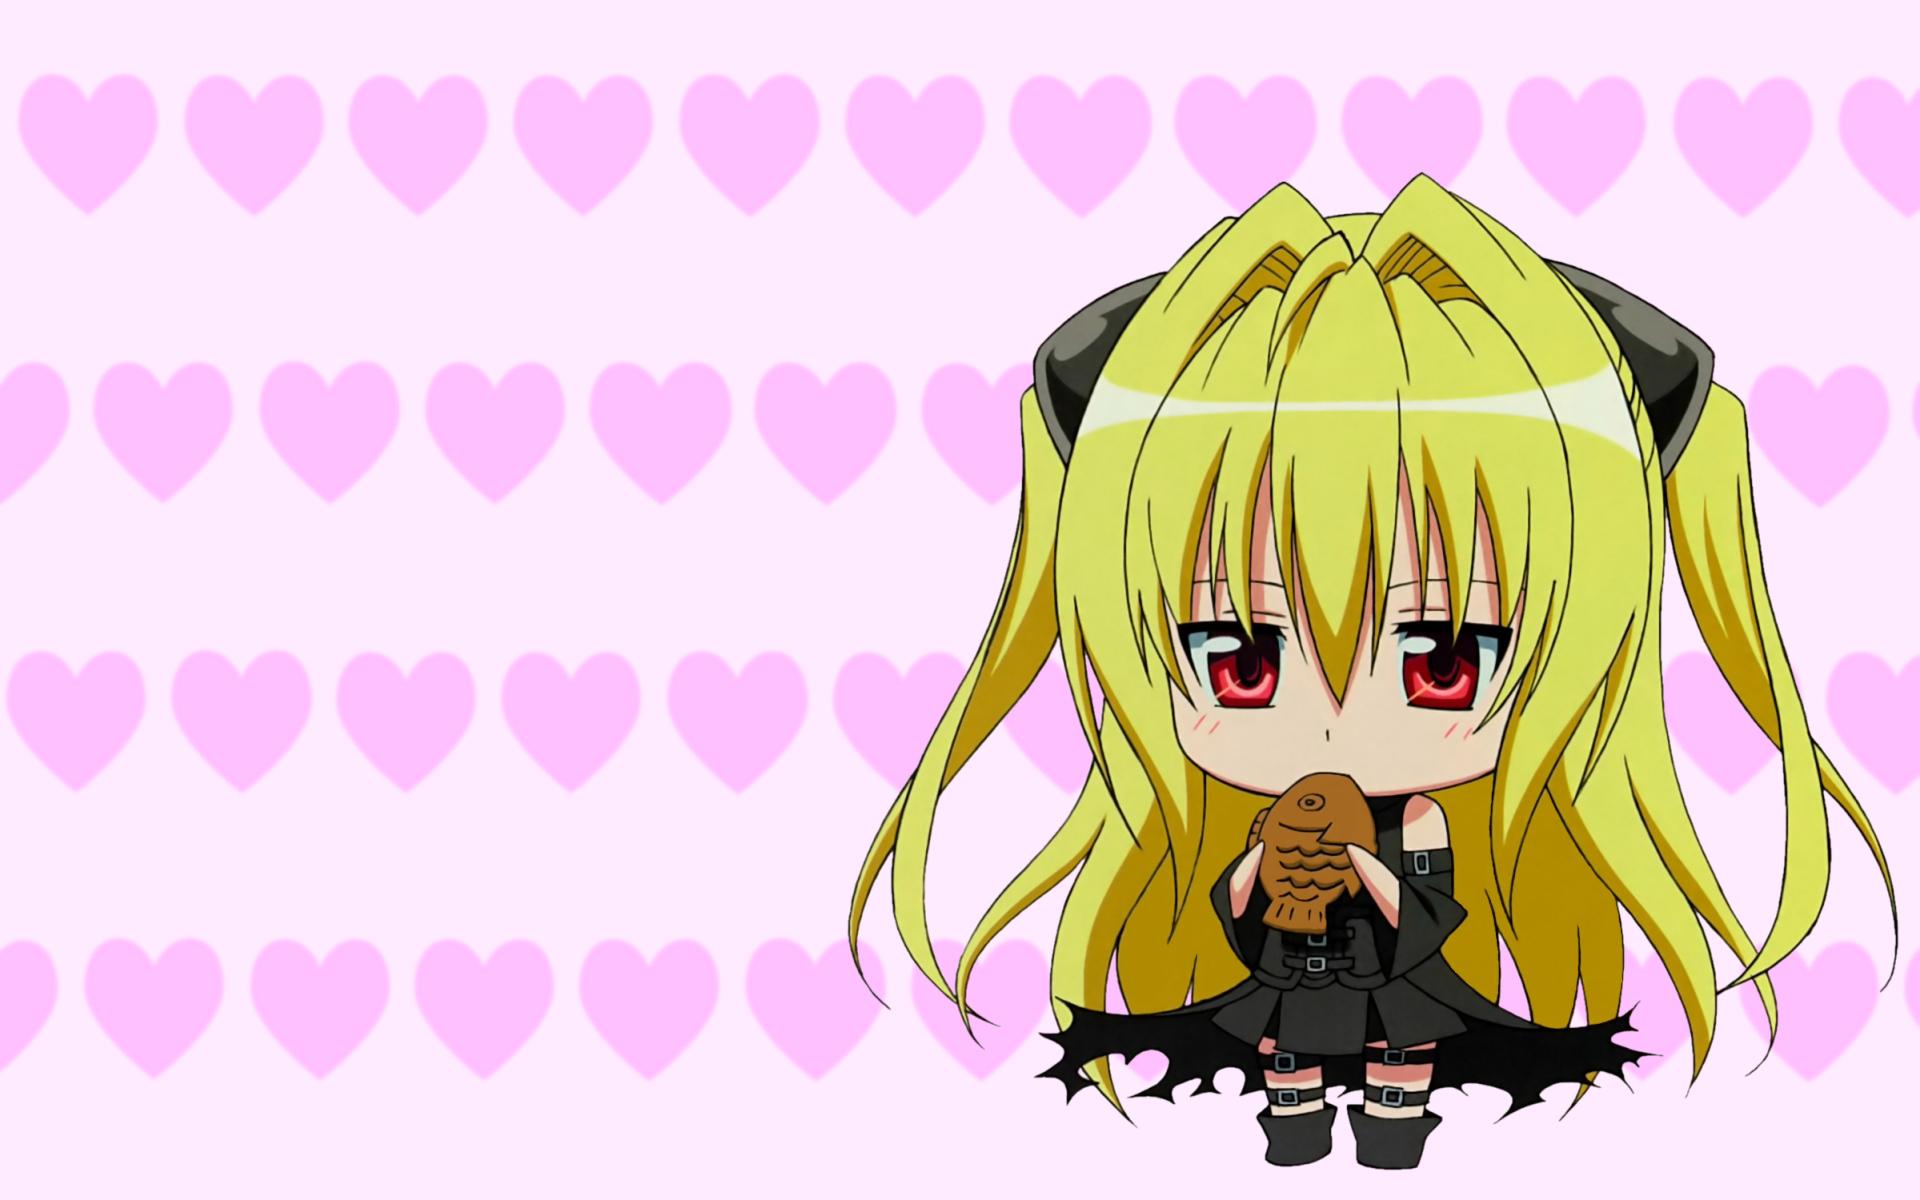 Anime To Love ru Wallpaper 1920x1200 Anime To Loveru 1920x1200